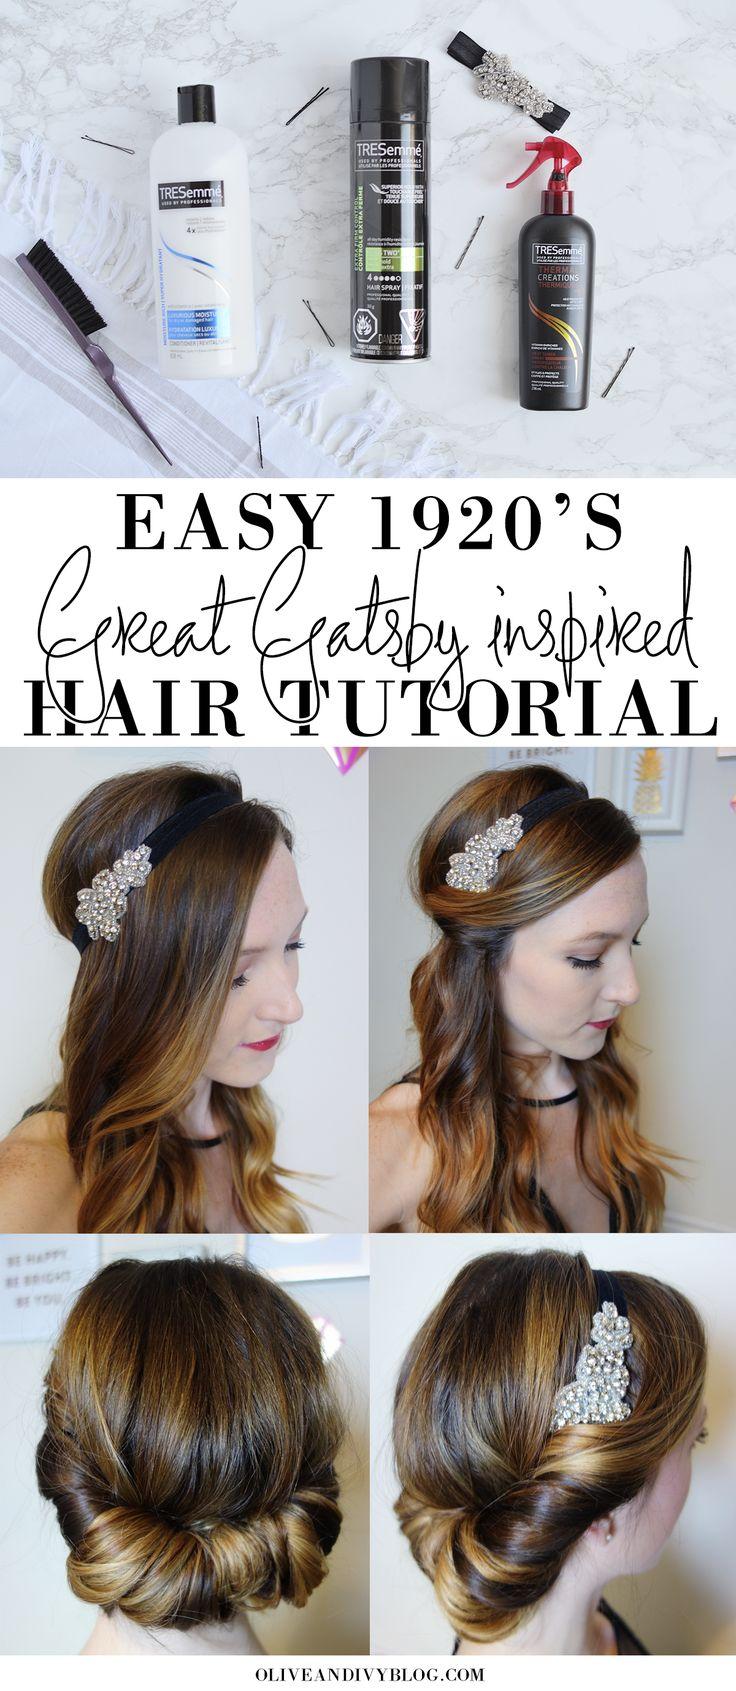 easy 1920's great gatsby hair tutorial